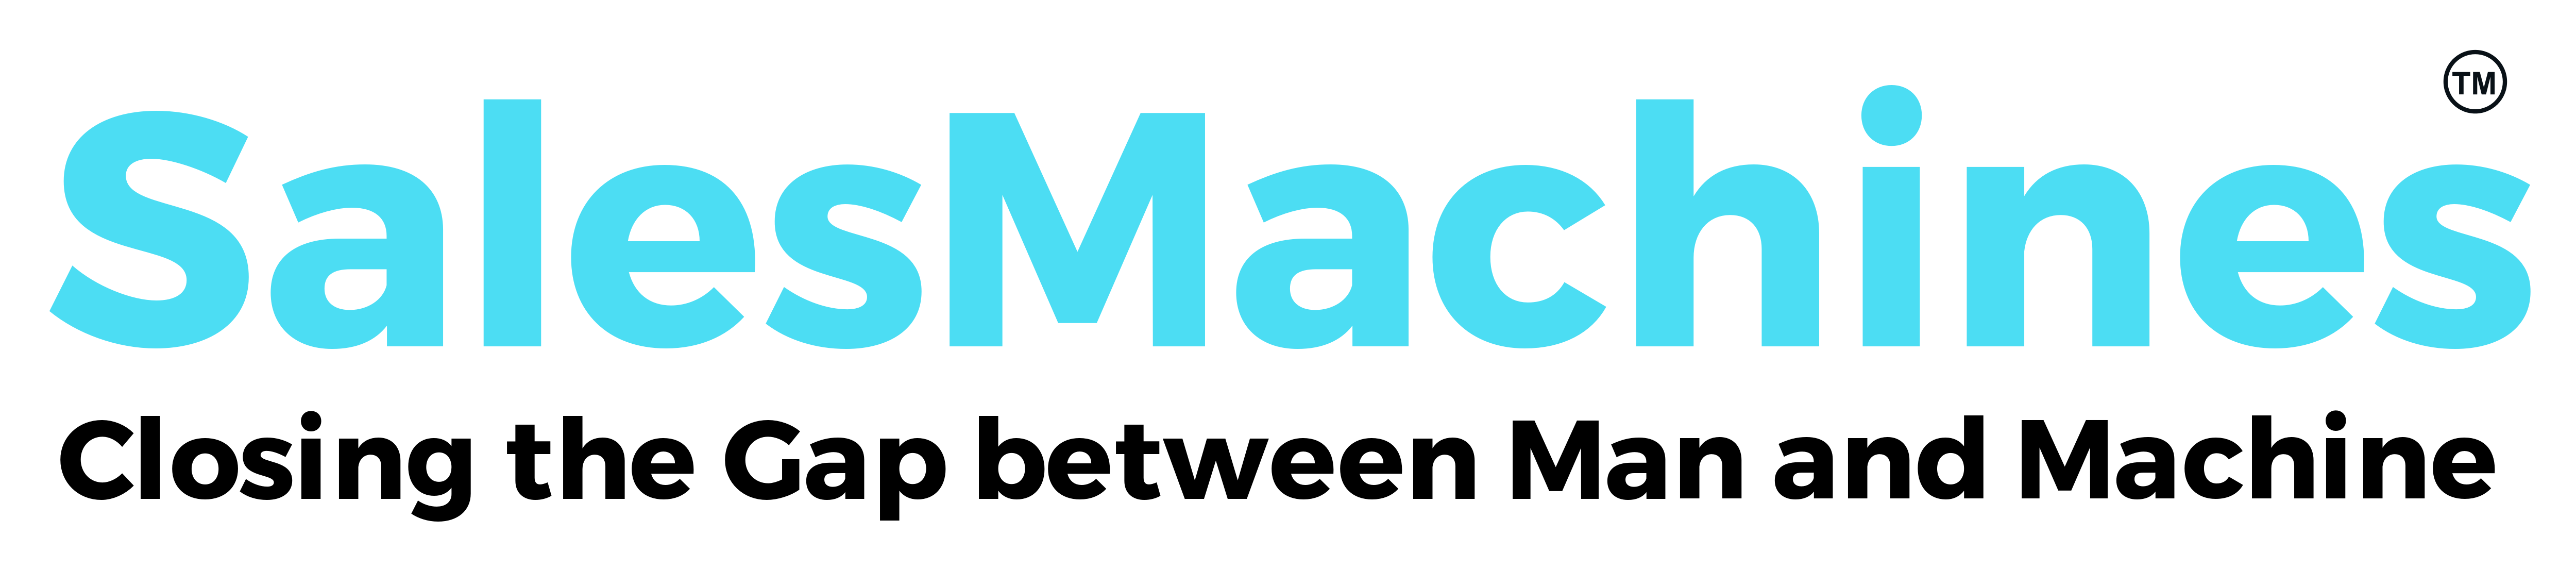 SalesMachines